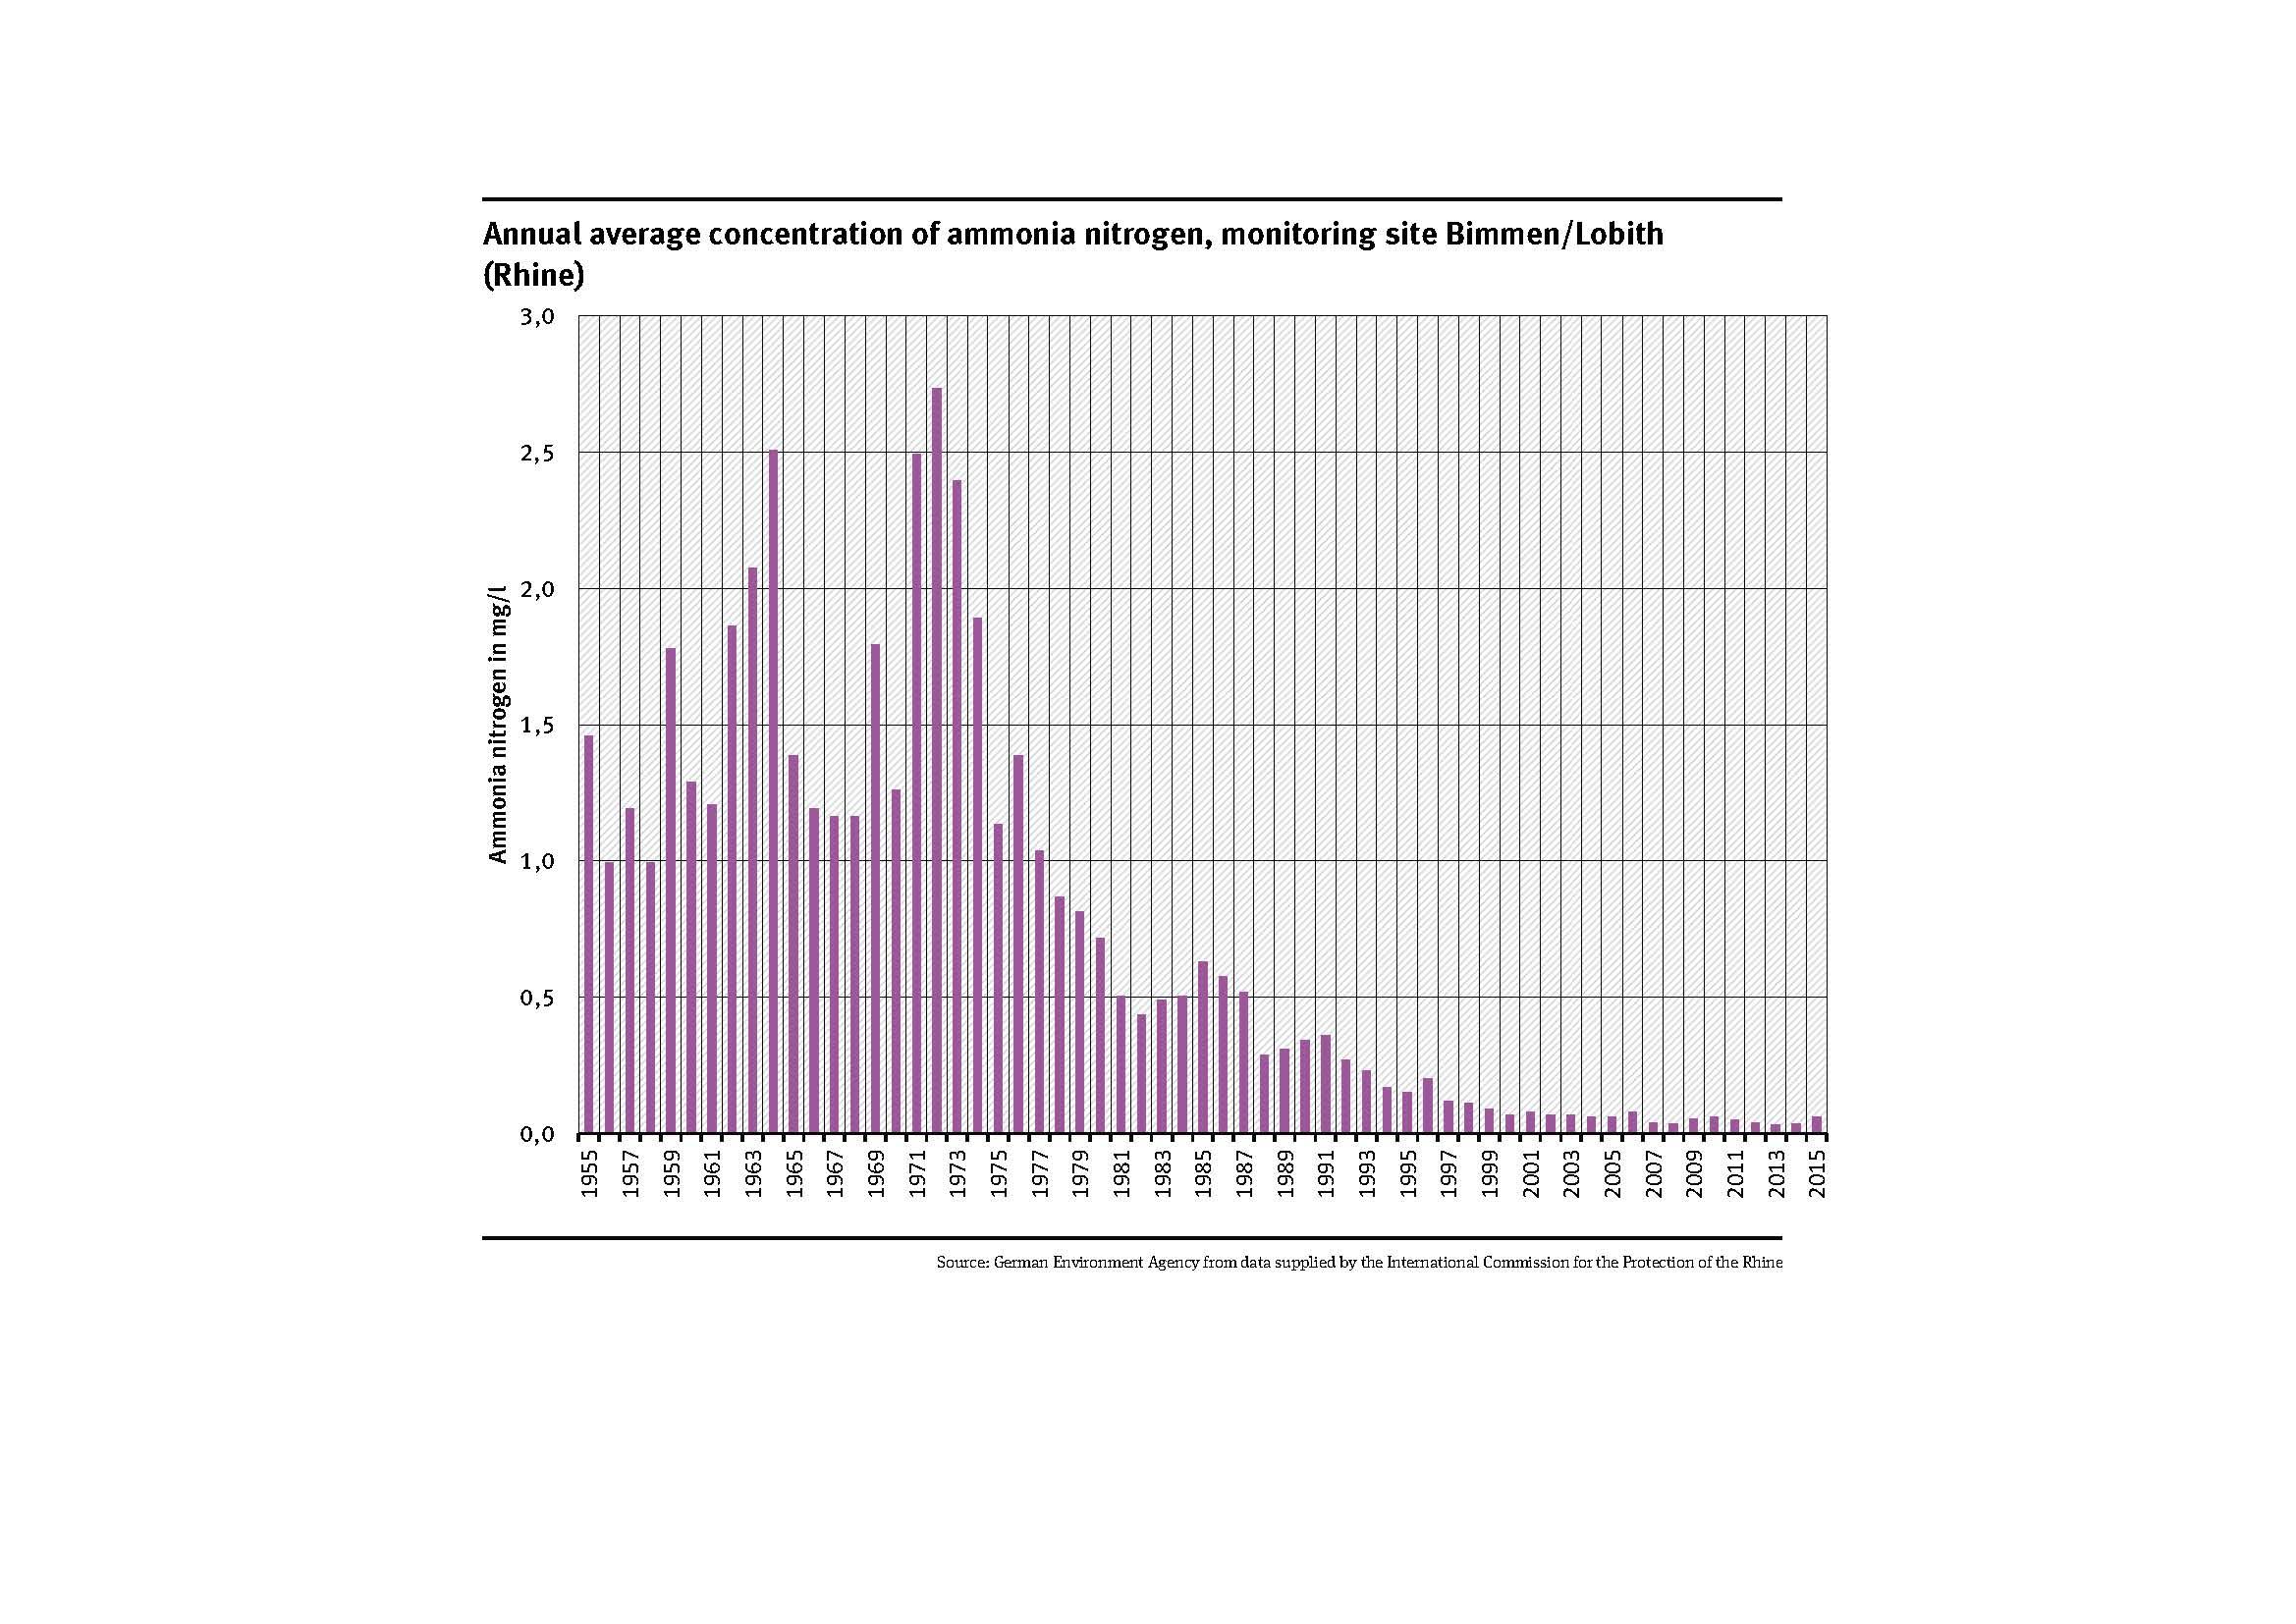 Annual average concentration of ammonia nitrogen